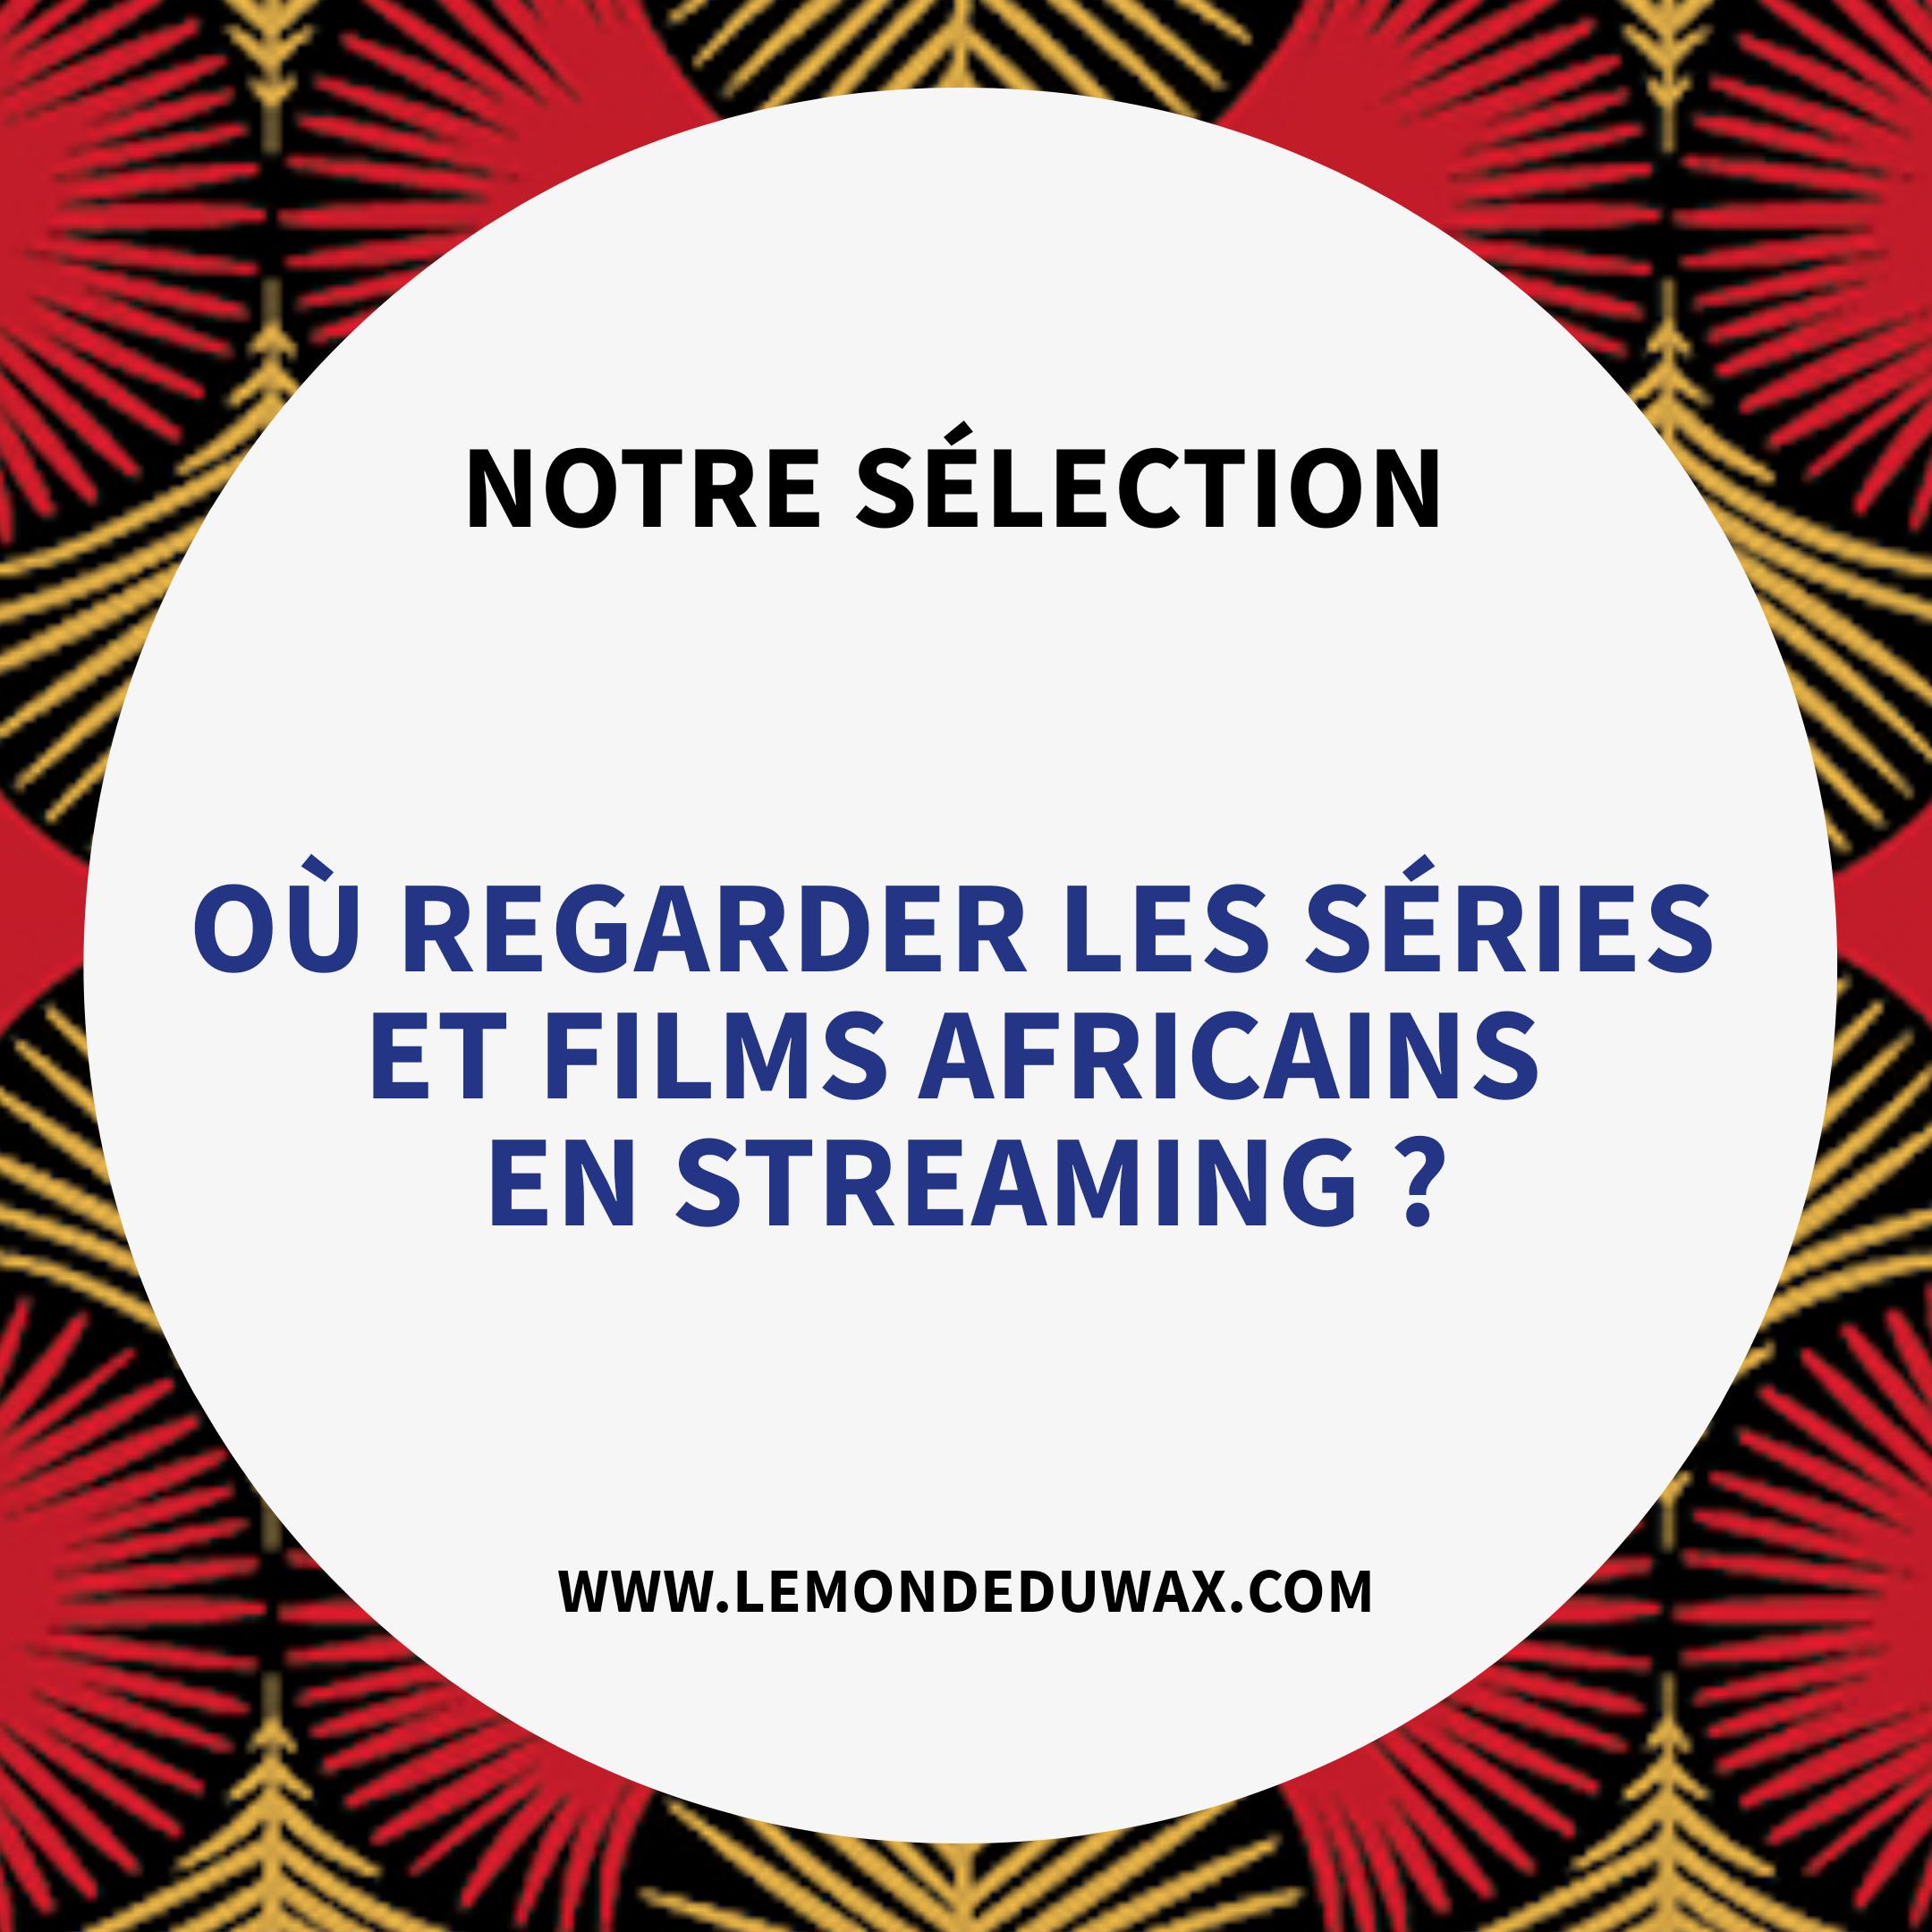 Où regarder des séries et films africains en streaming?